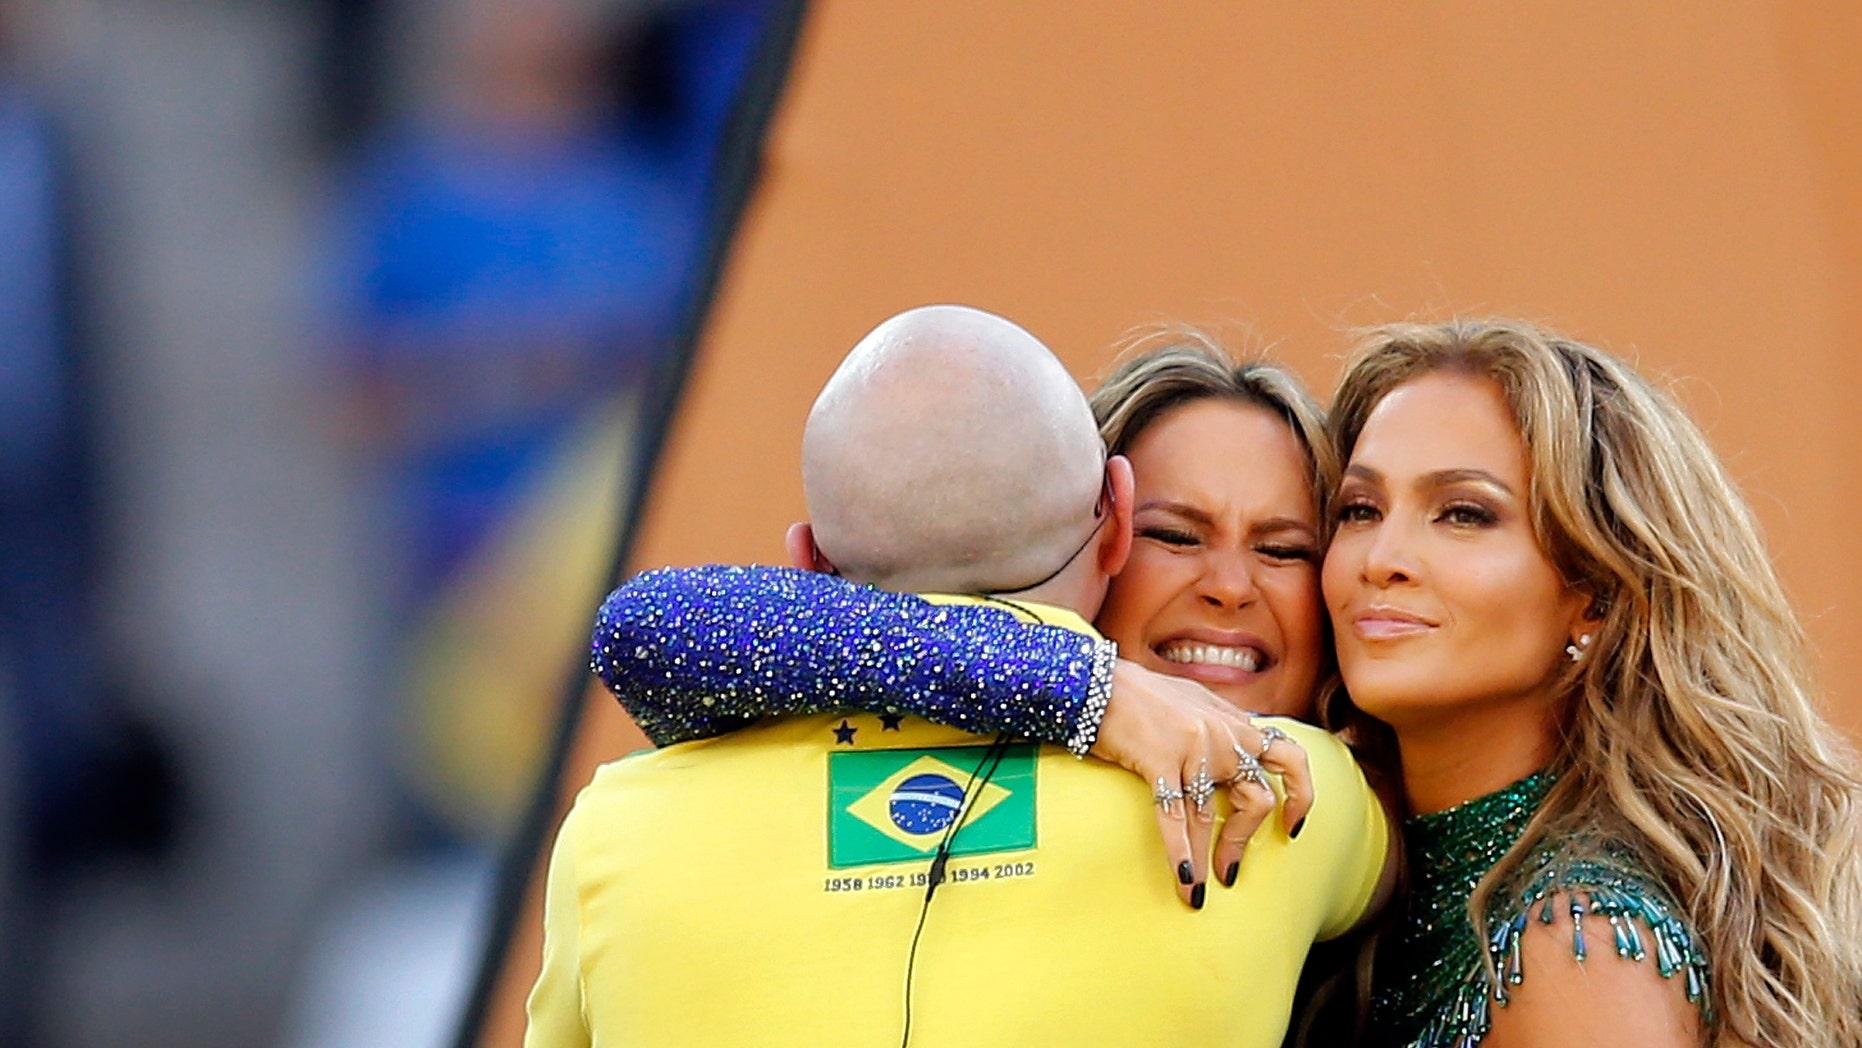 Brazilian singer Claudia Leitte embraces Jennifer Lopez and Pitbull in the Itaquerao Stadium in Sao Paulo, June 12, 2014.